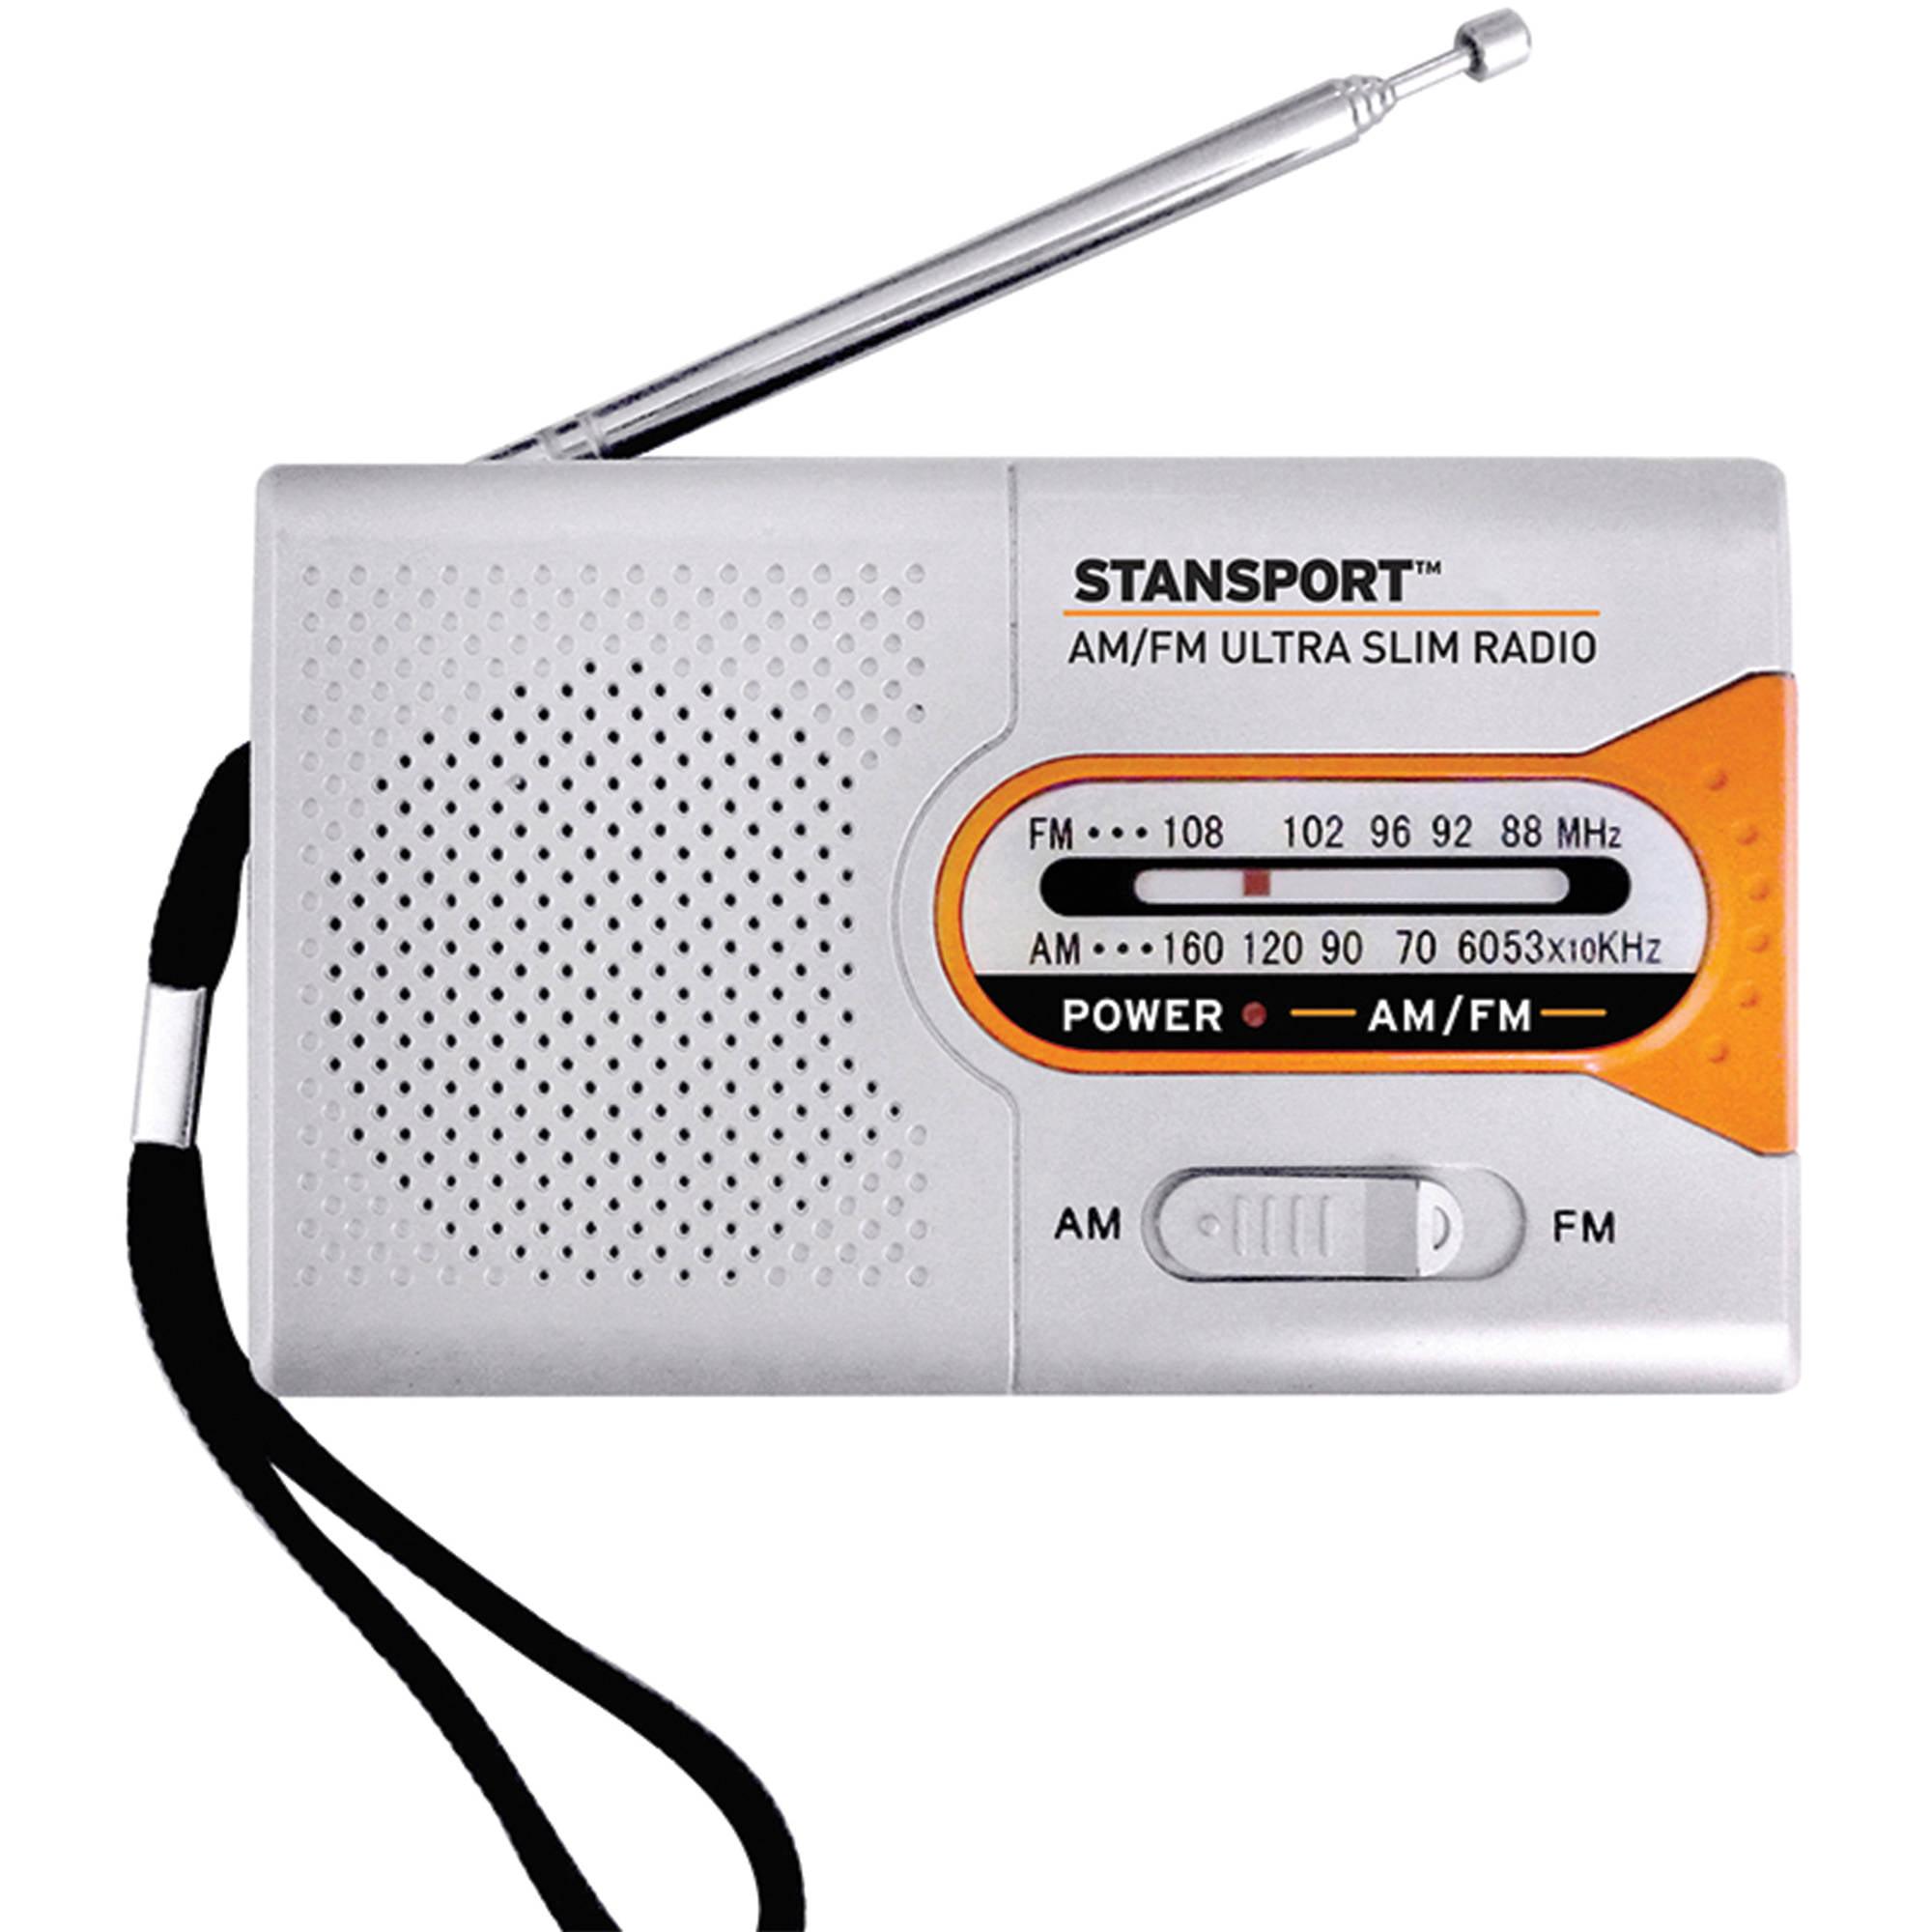 Stansport Emergency AM FM Radio by DollarItemDirect